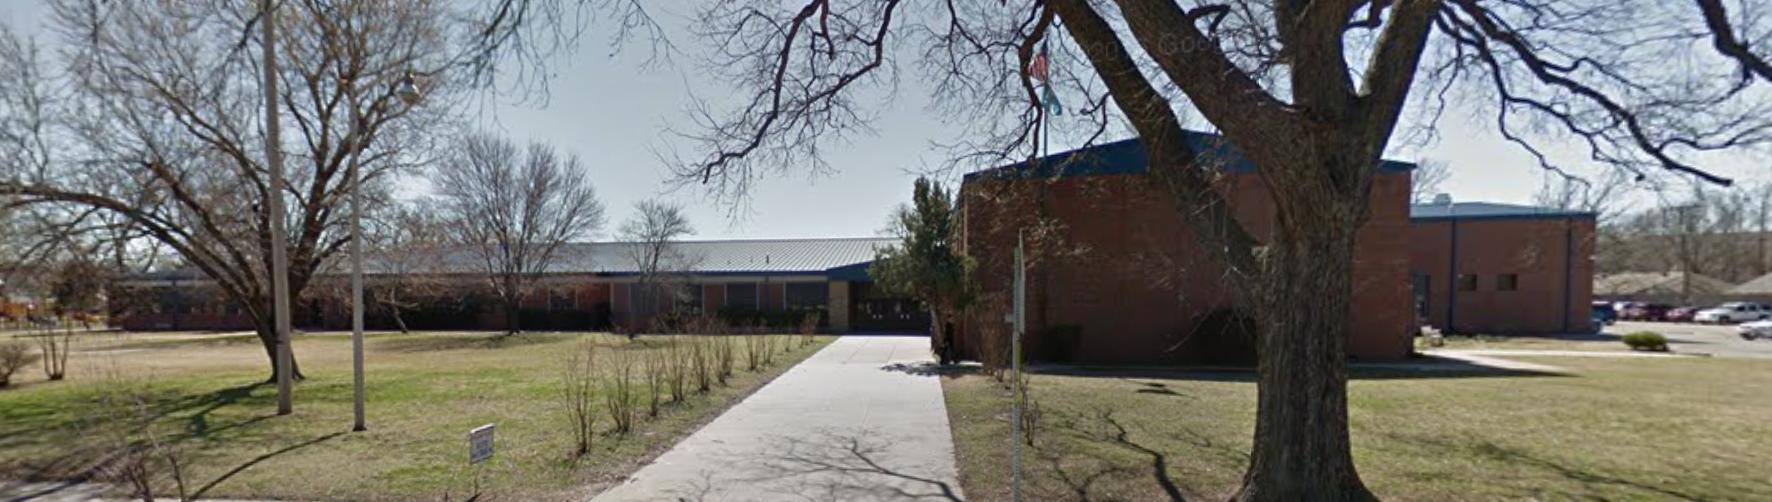 John Marshall Elementary School   UpPresent Wiki   FANDOM powered by